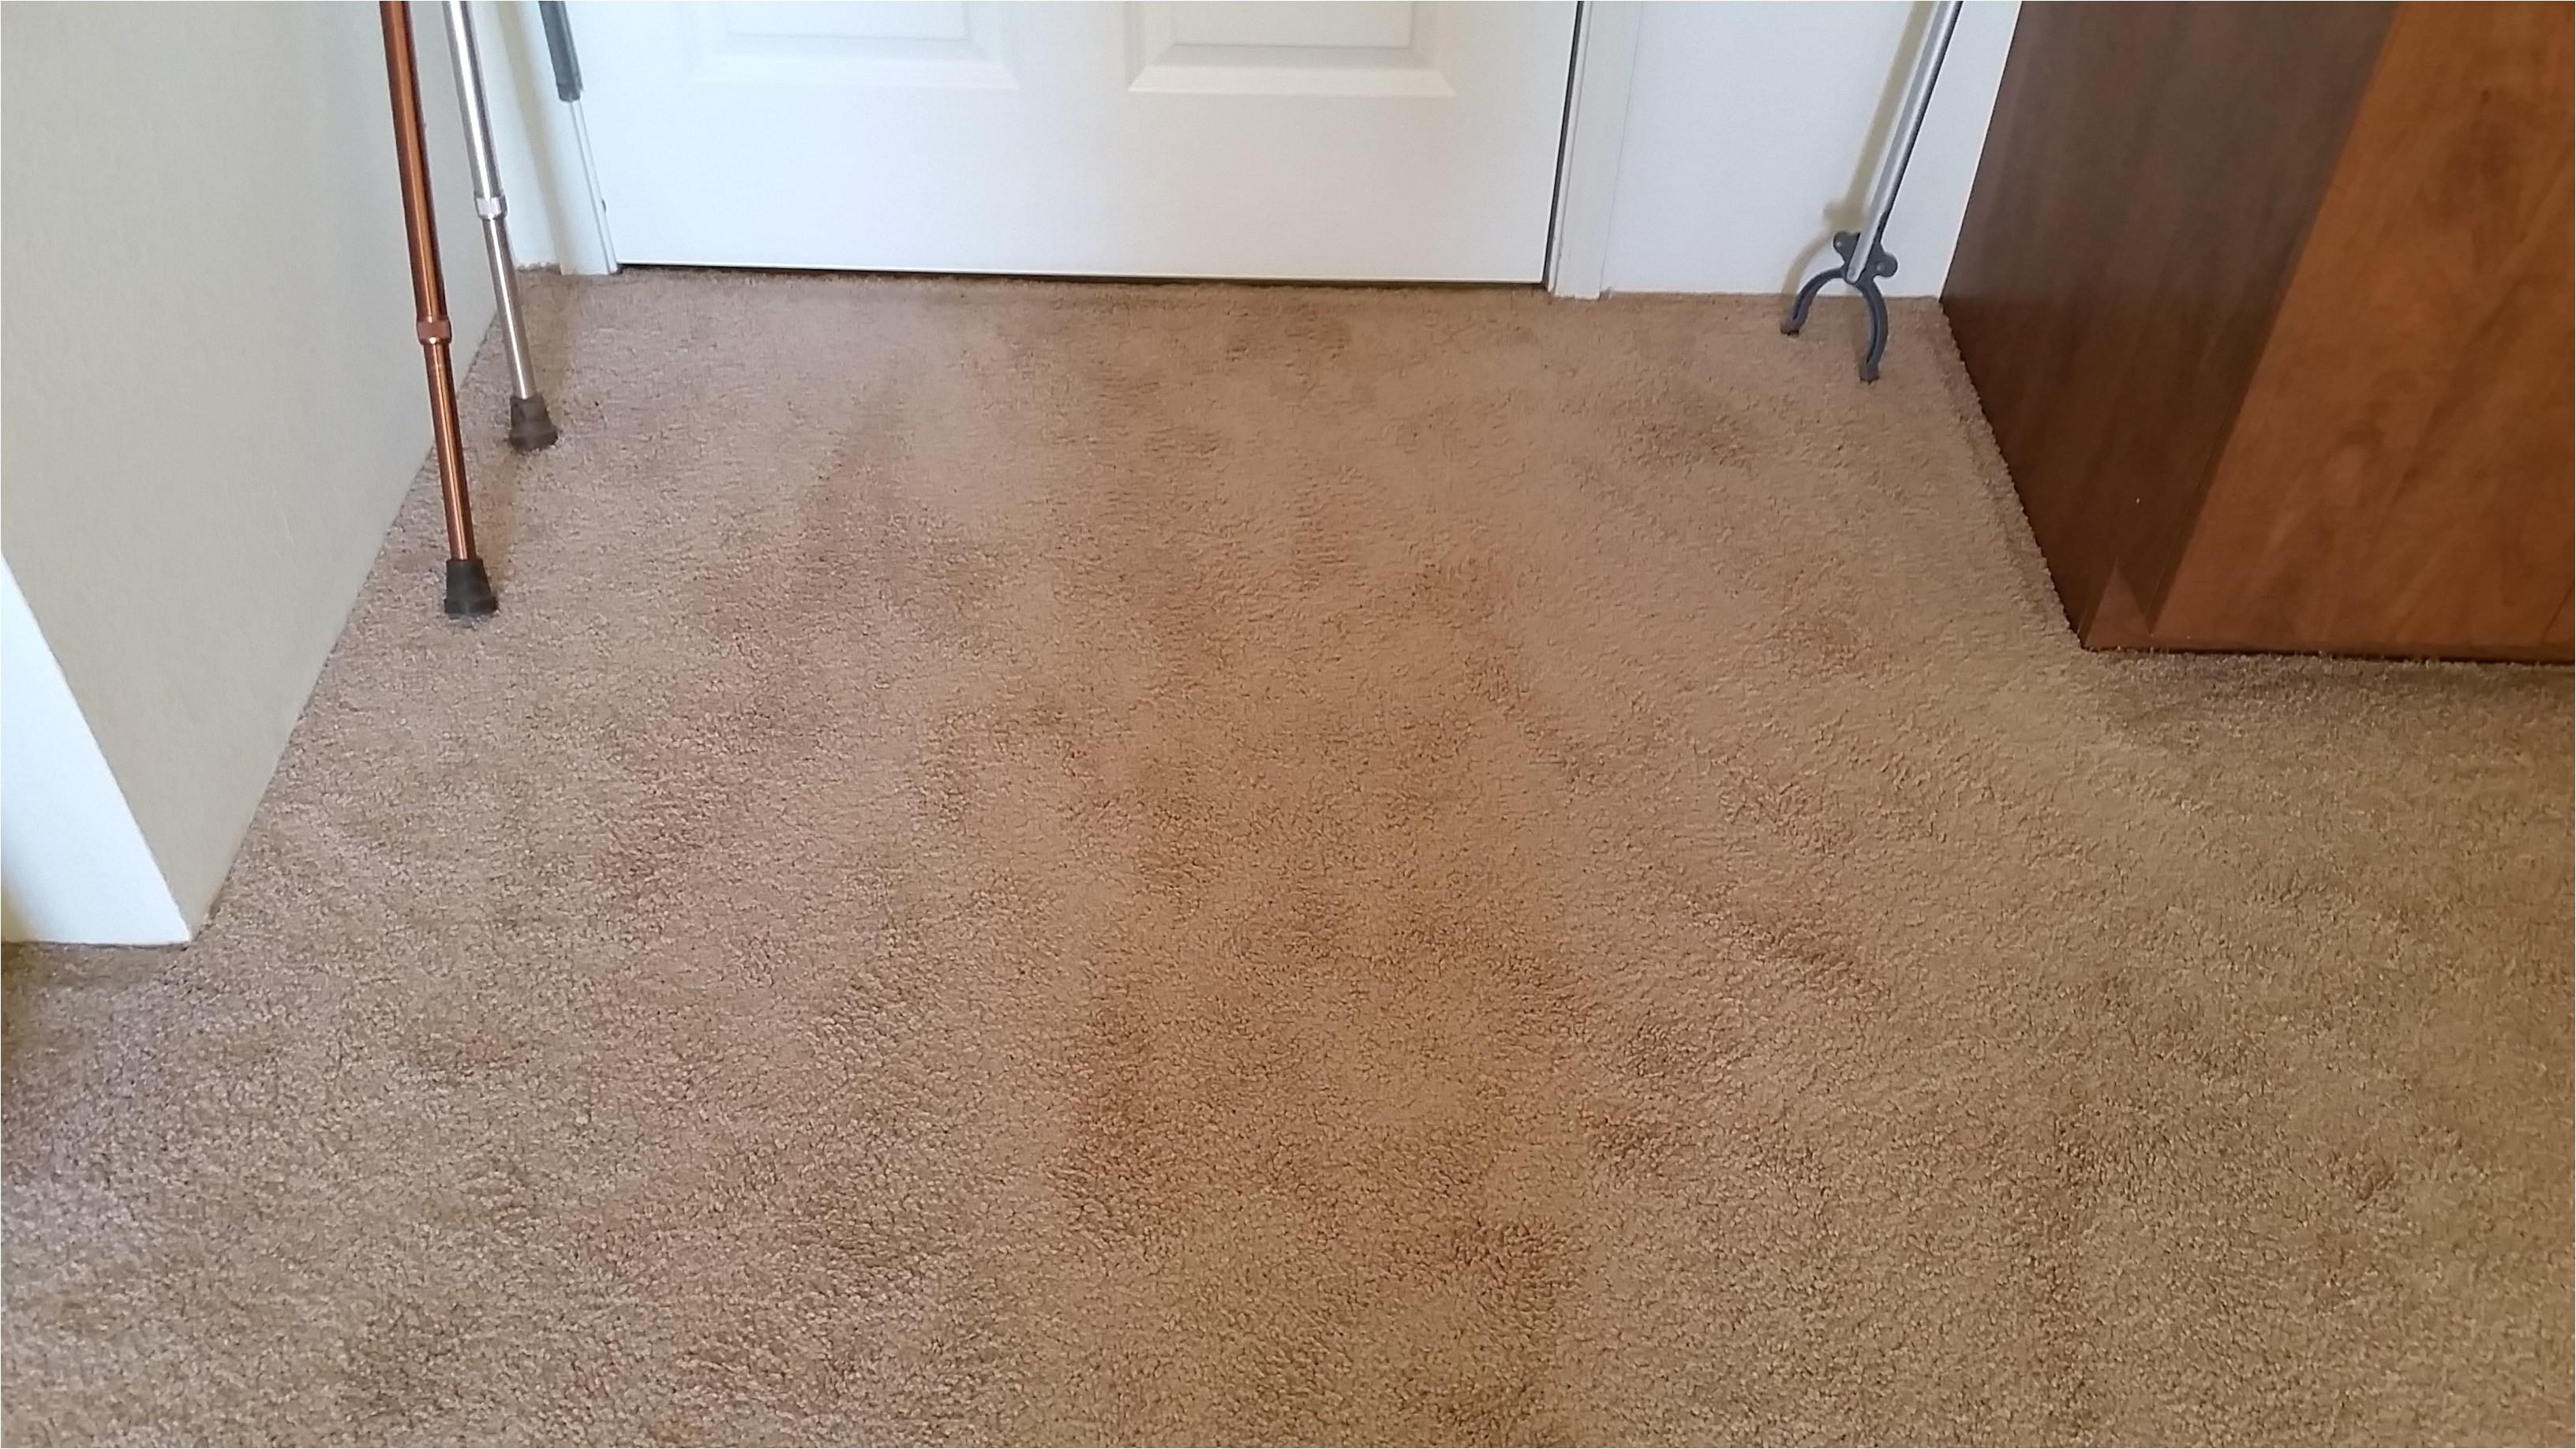 Carpet Cleaning In Rio Rancho Rio Rancho Carpet Cleaning Carpet Repair Cleaning